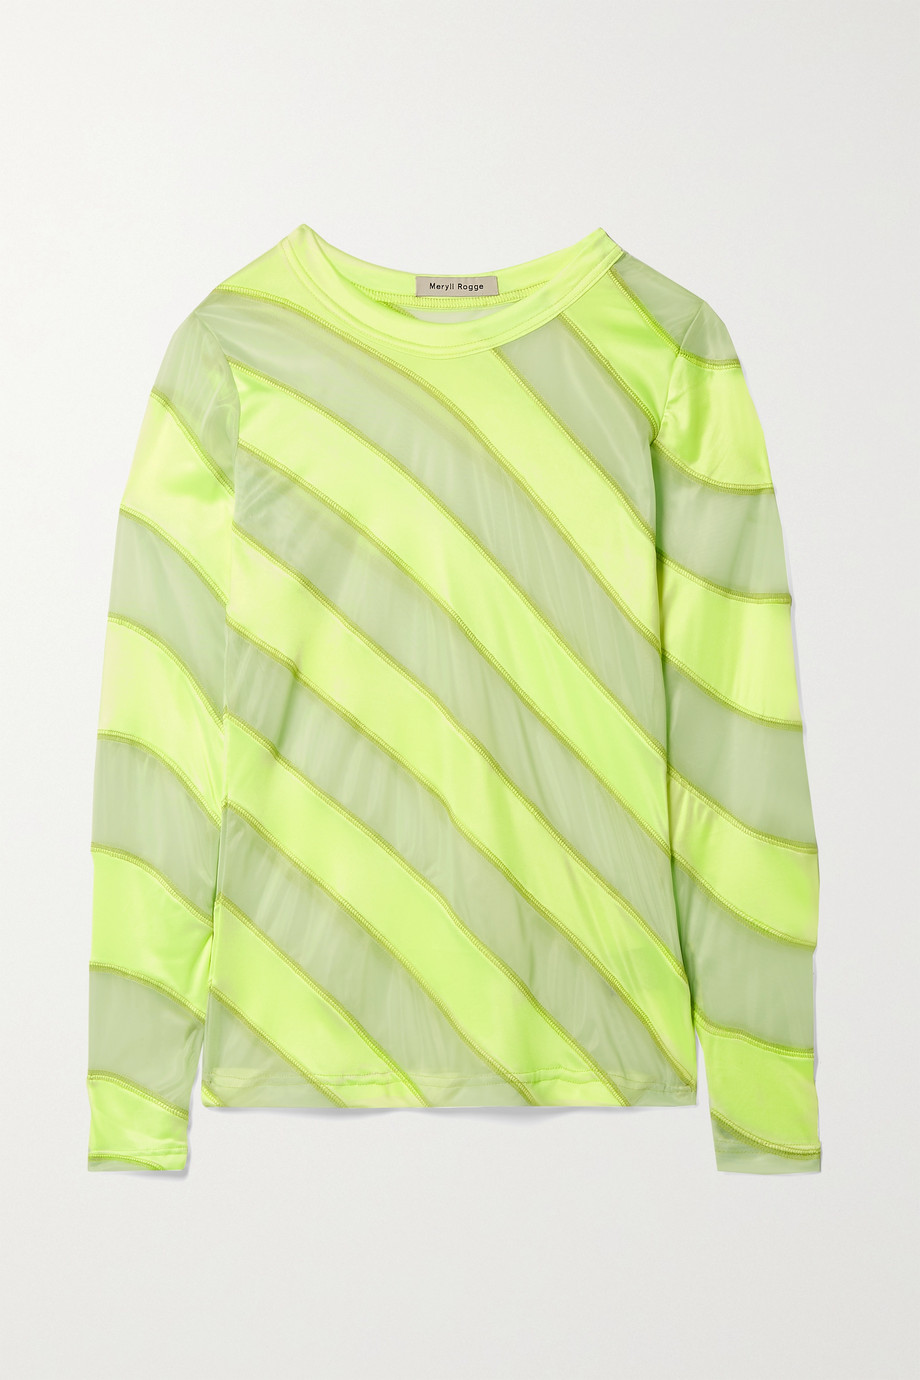 Meryll Rogge Neon satin-jersey and mesh top